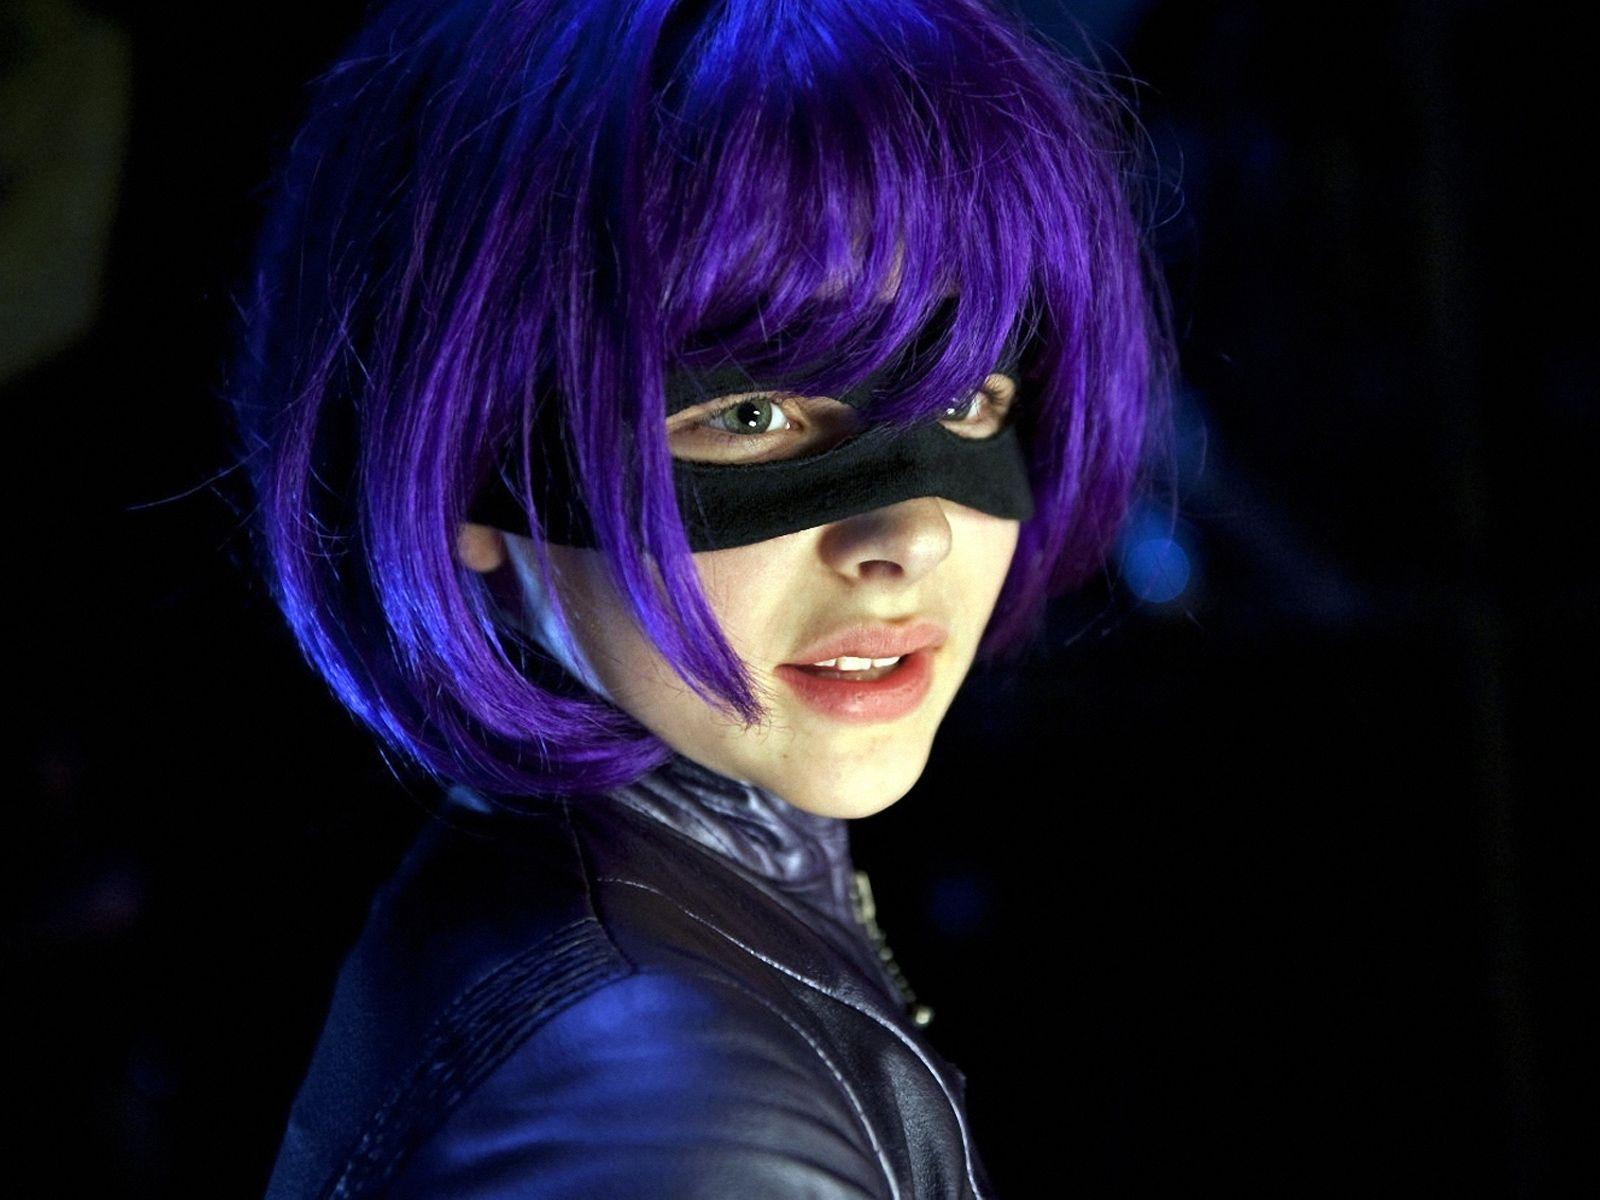 Chloe Grace Moretz Is Hit Girl Femmes People ヒット ガール と